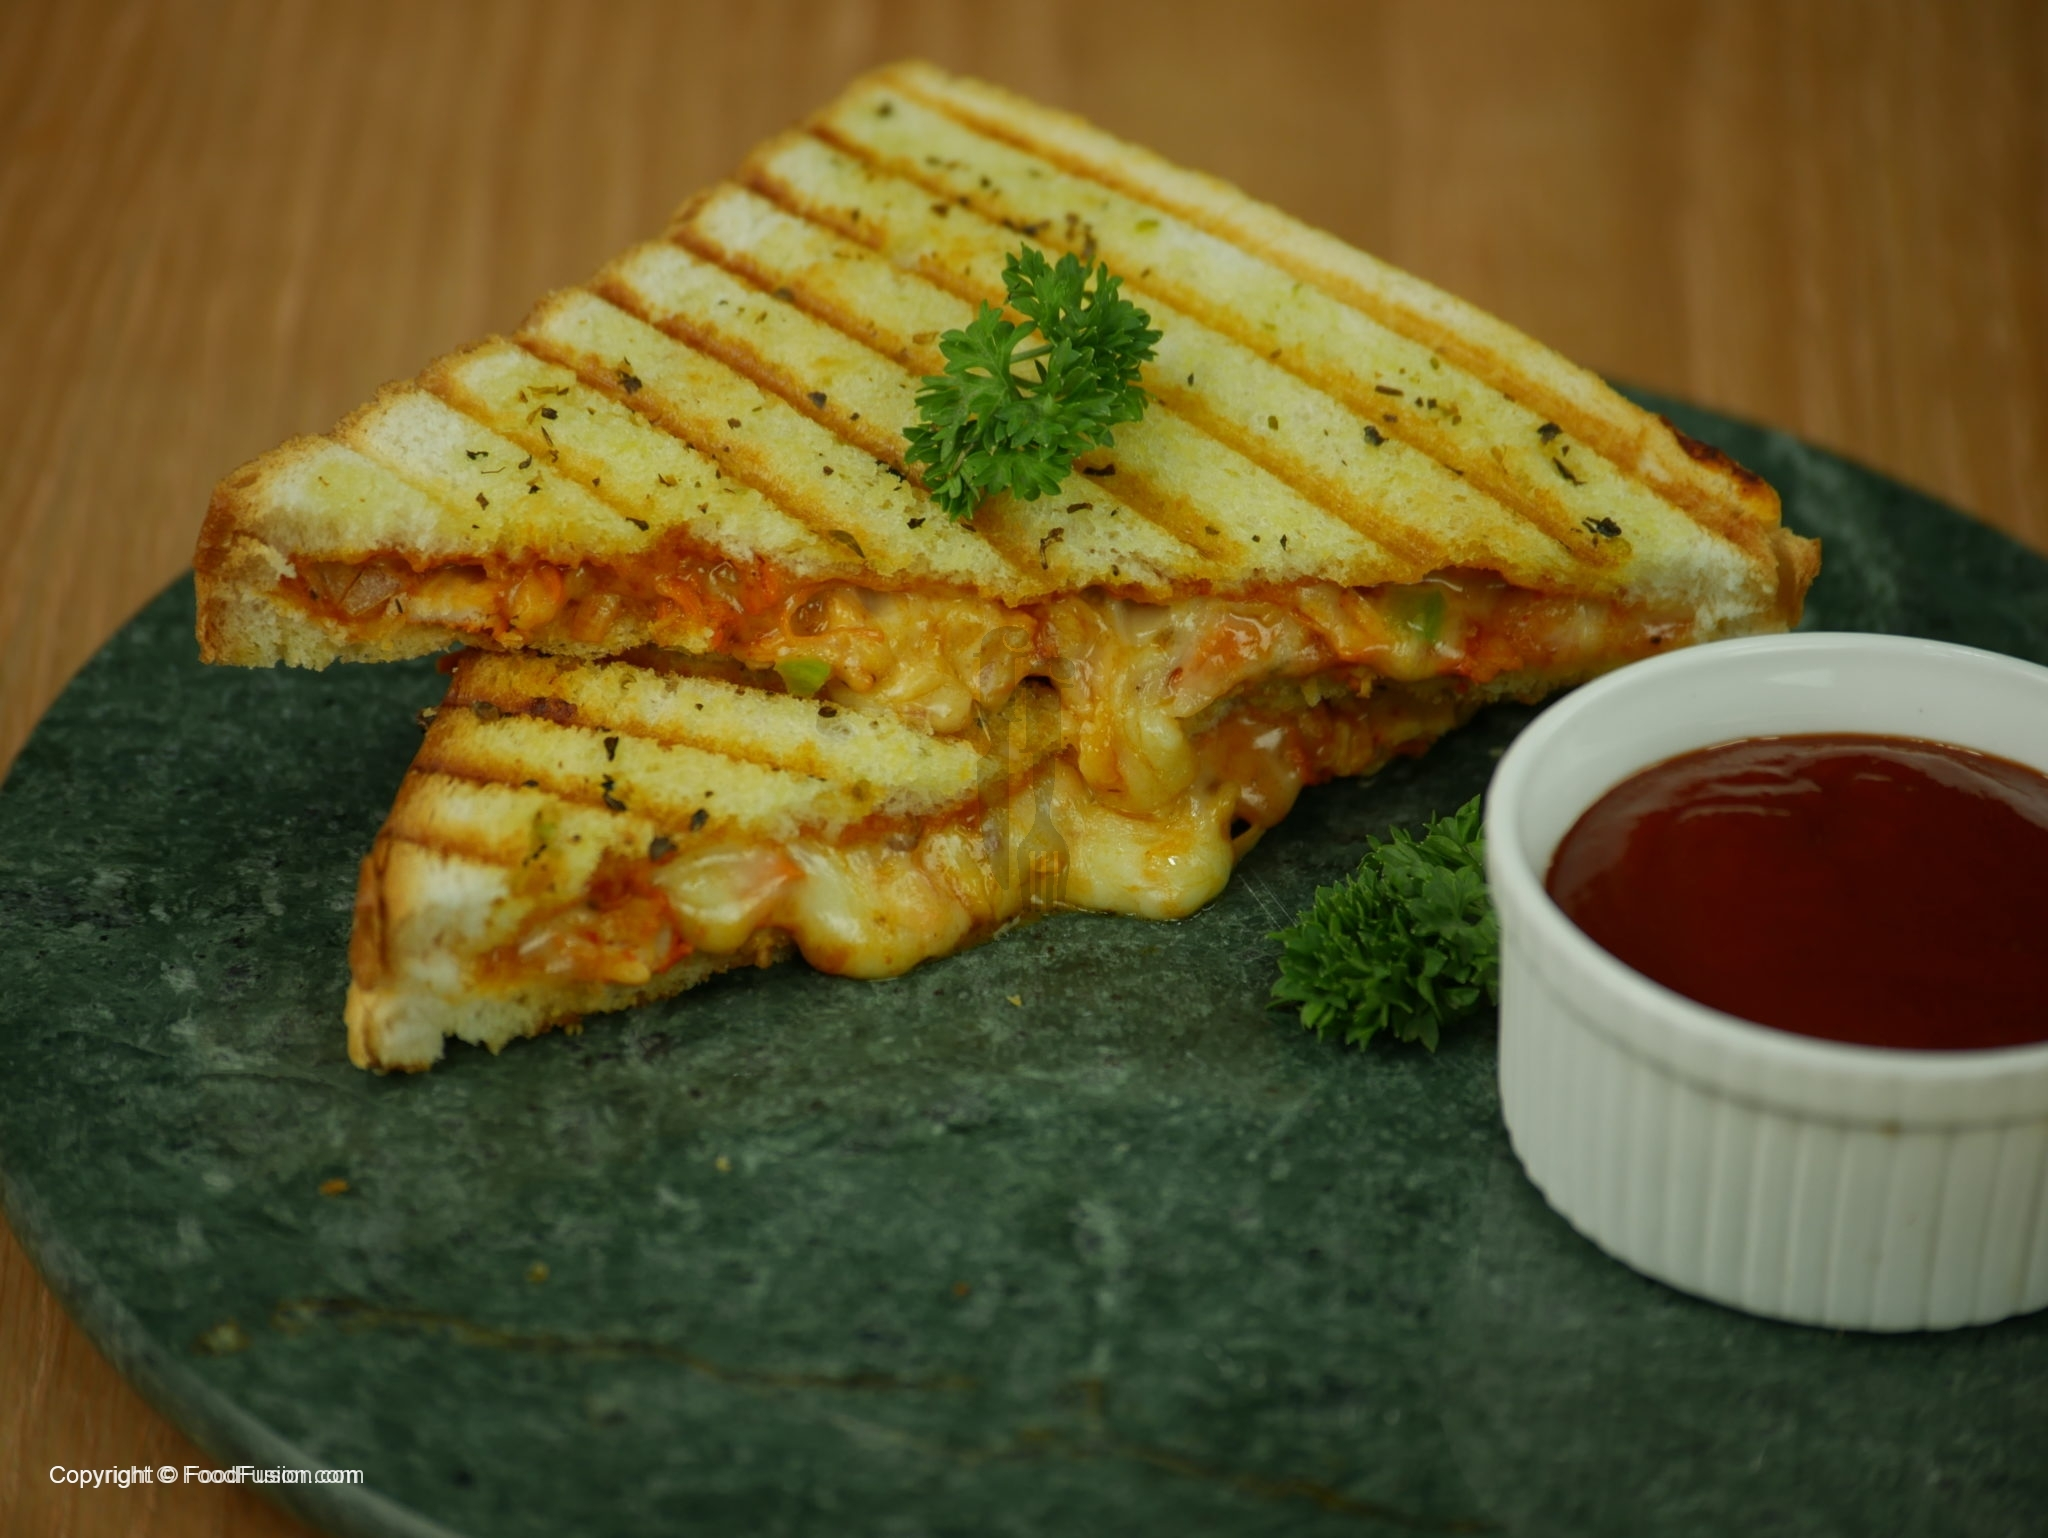 Grilled Pizza Sandwich